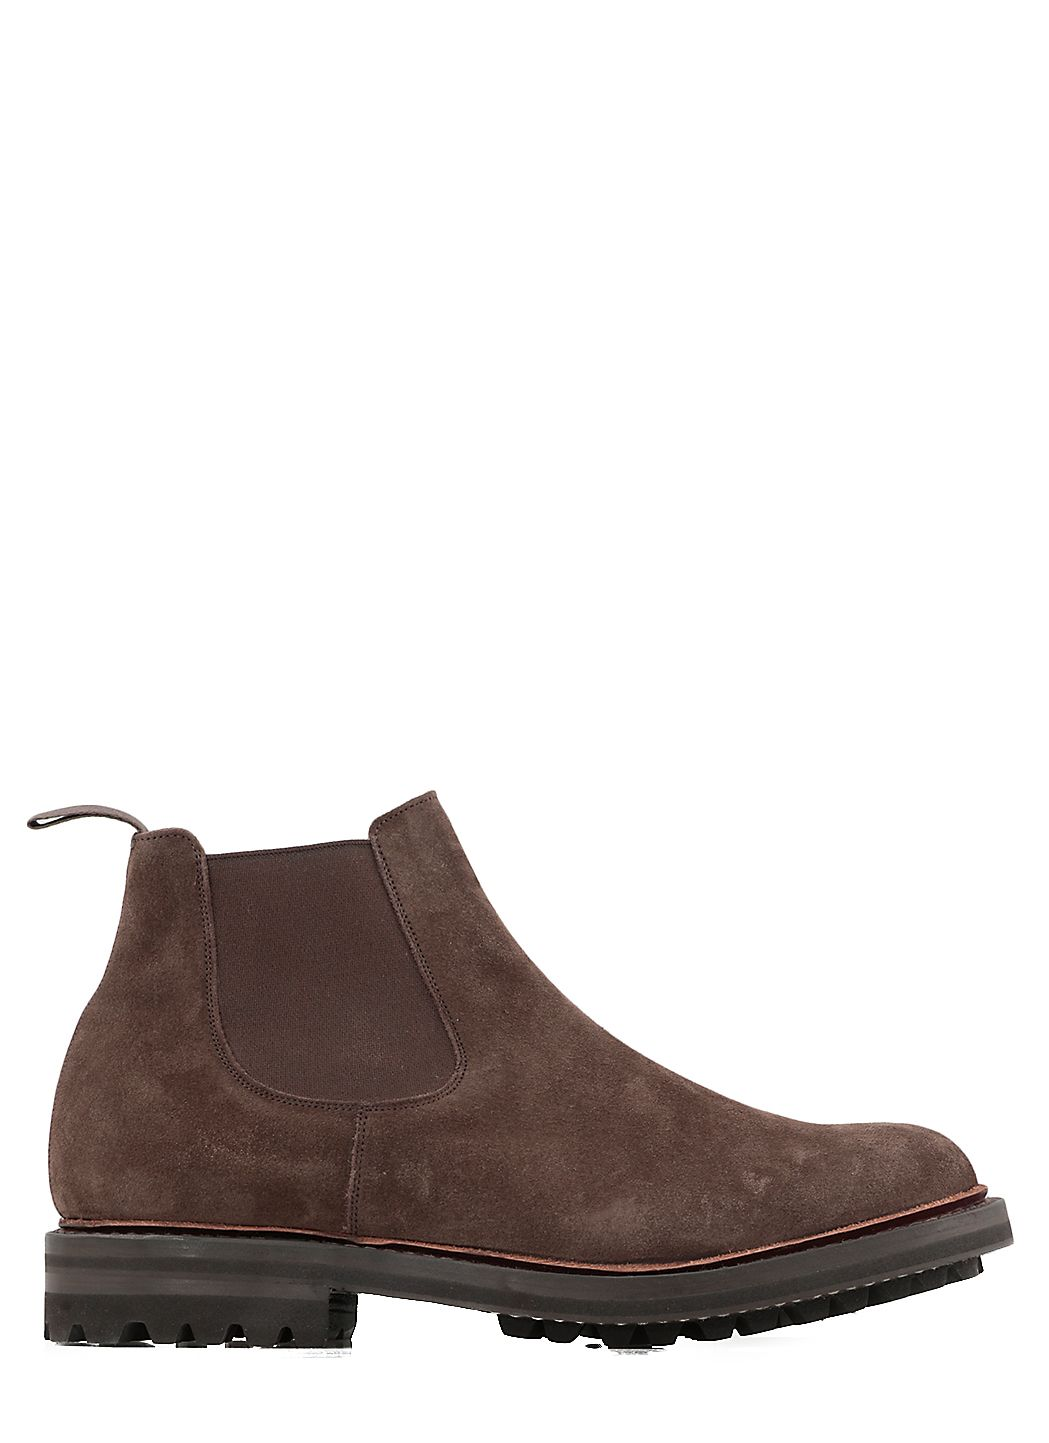 Mccarthy lw chelsea boot